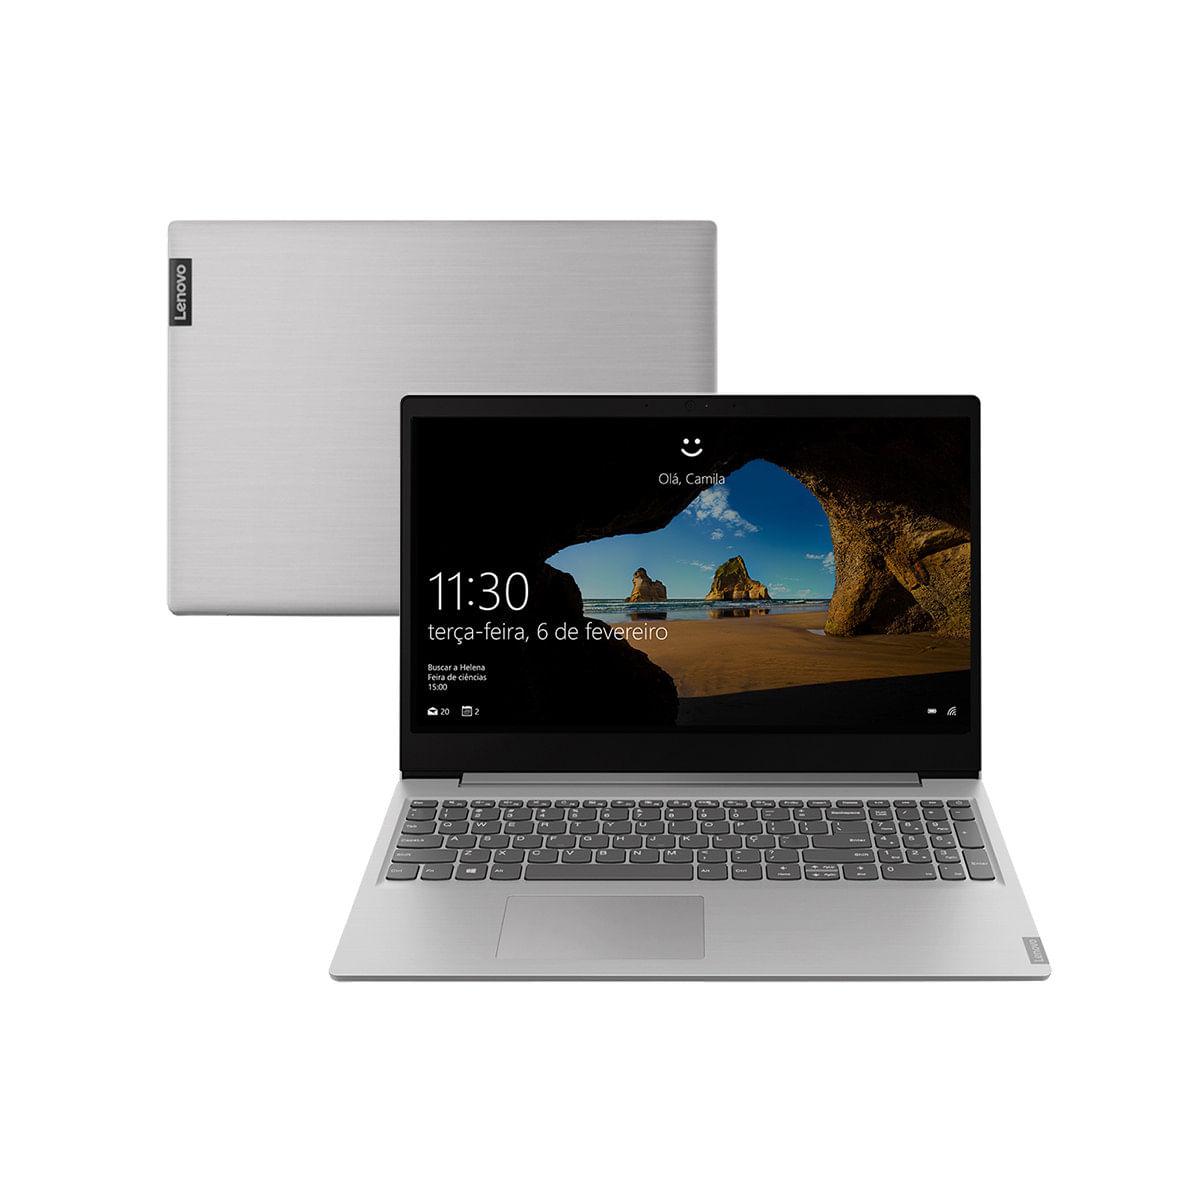 Notebook Lenovo Ideapad S145 AMD Ryzen 5 12GB 1TB W10 15,6